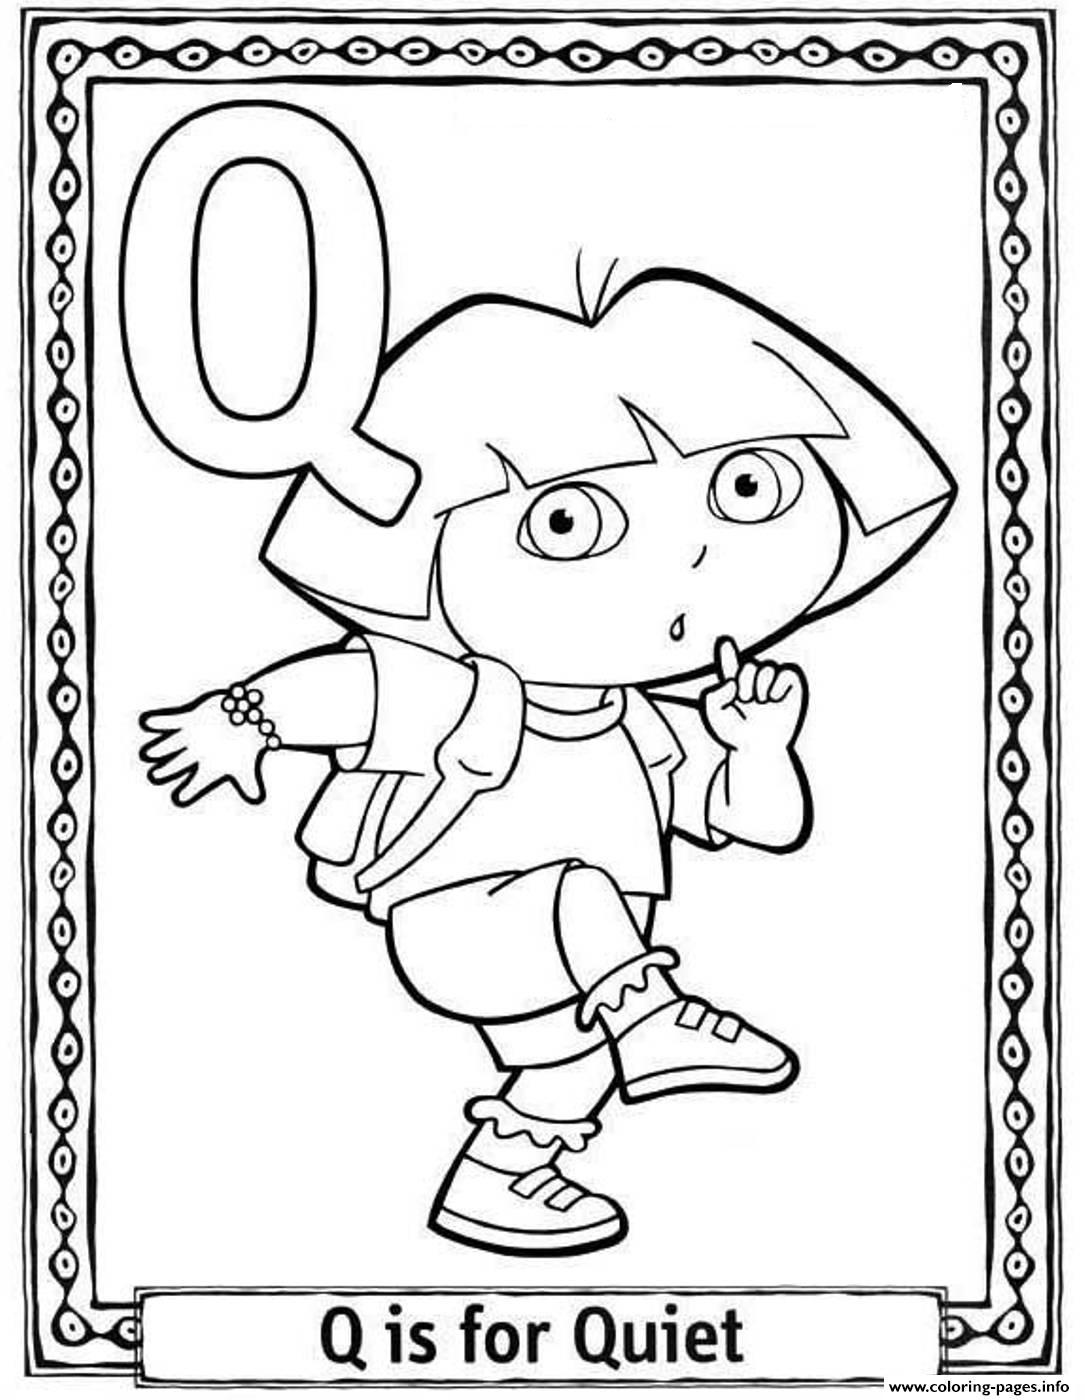 Dora Quiet Alphabet S0227 Coloring Pages Printable